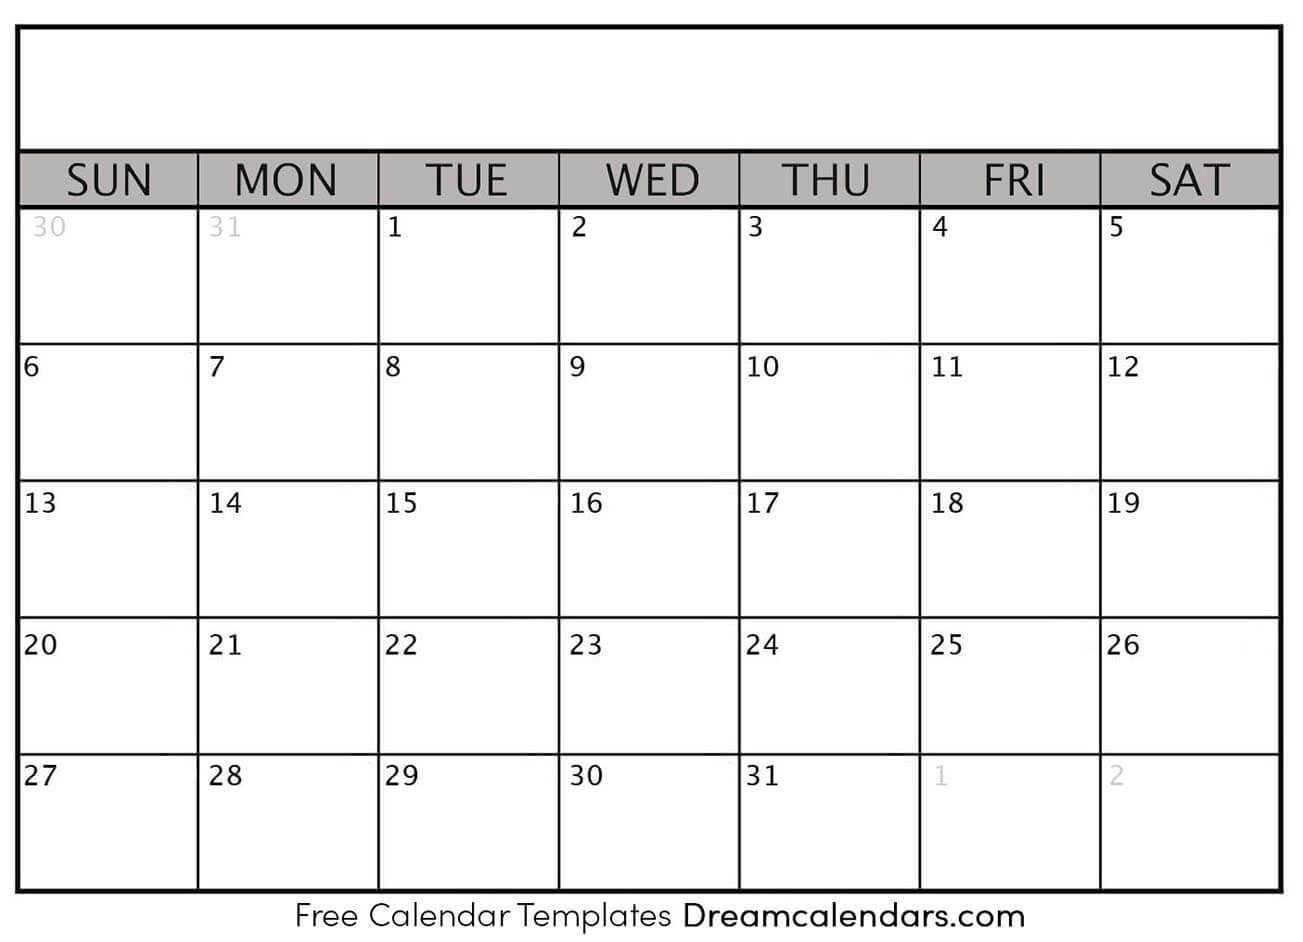 Printable Blank Calendar 2021 | Dream Calendars throughout Empty Calendar Printable